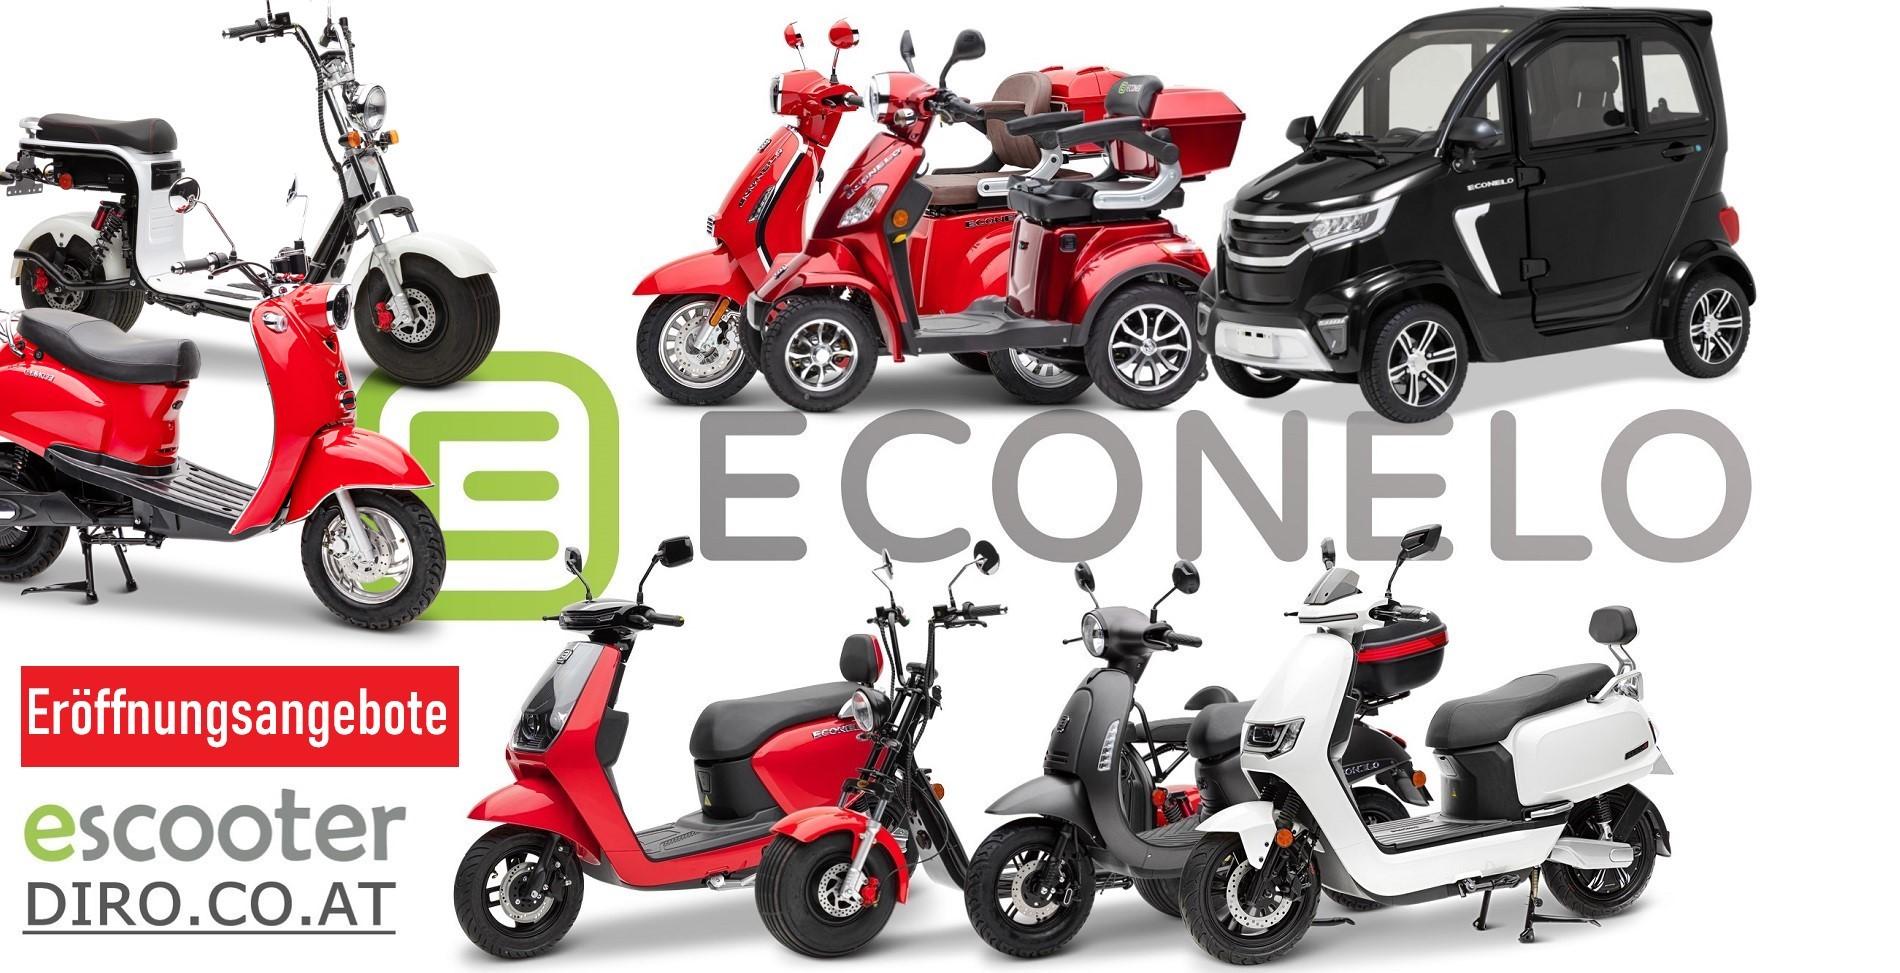 Elektro Roller Econelo, Zweirad, Dreirad, Vierrad, Kabinenroller